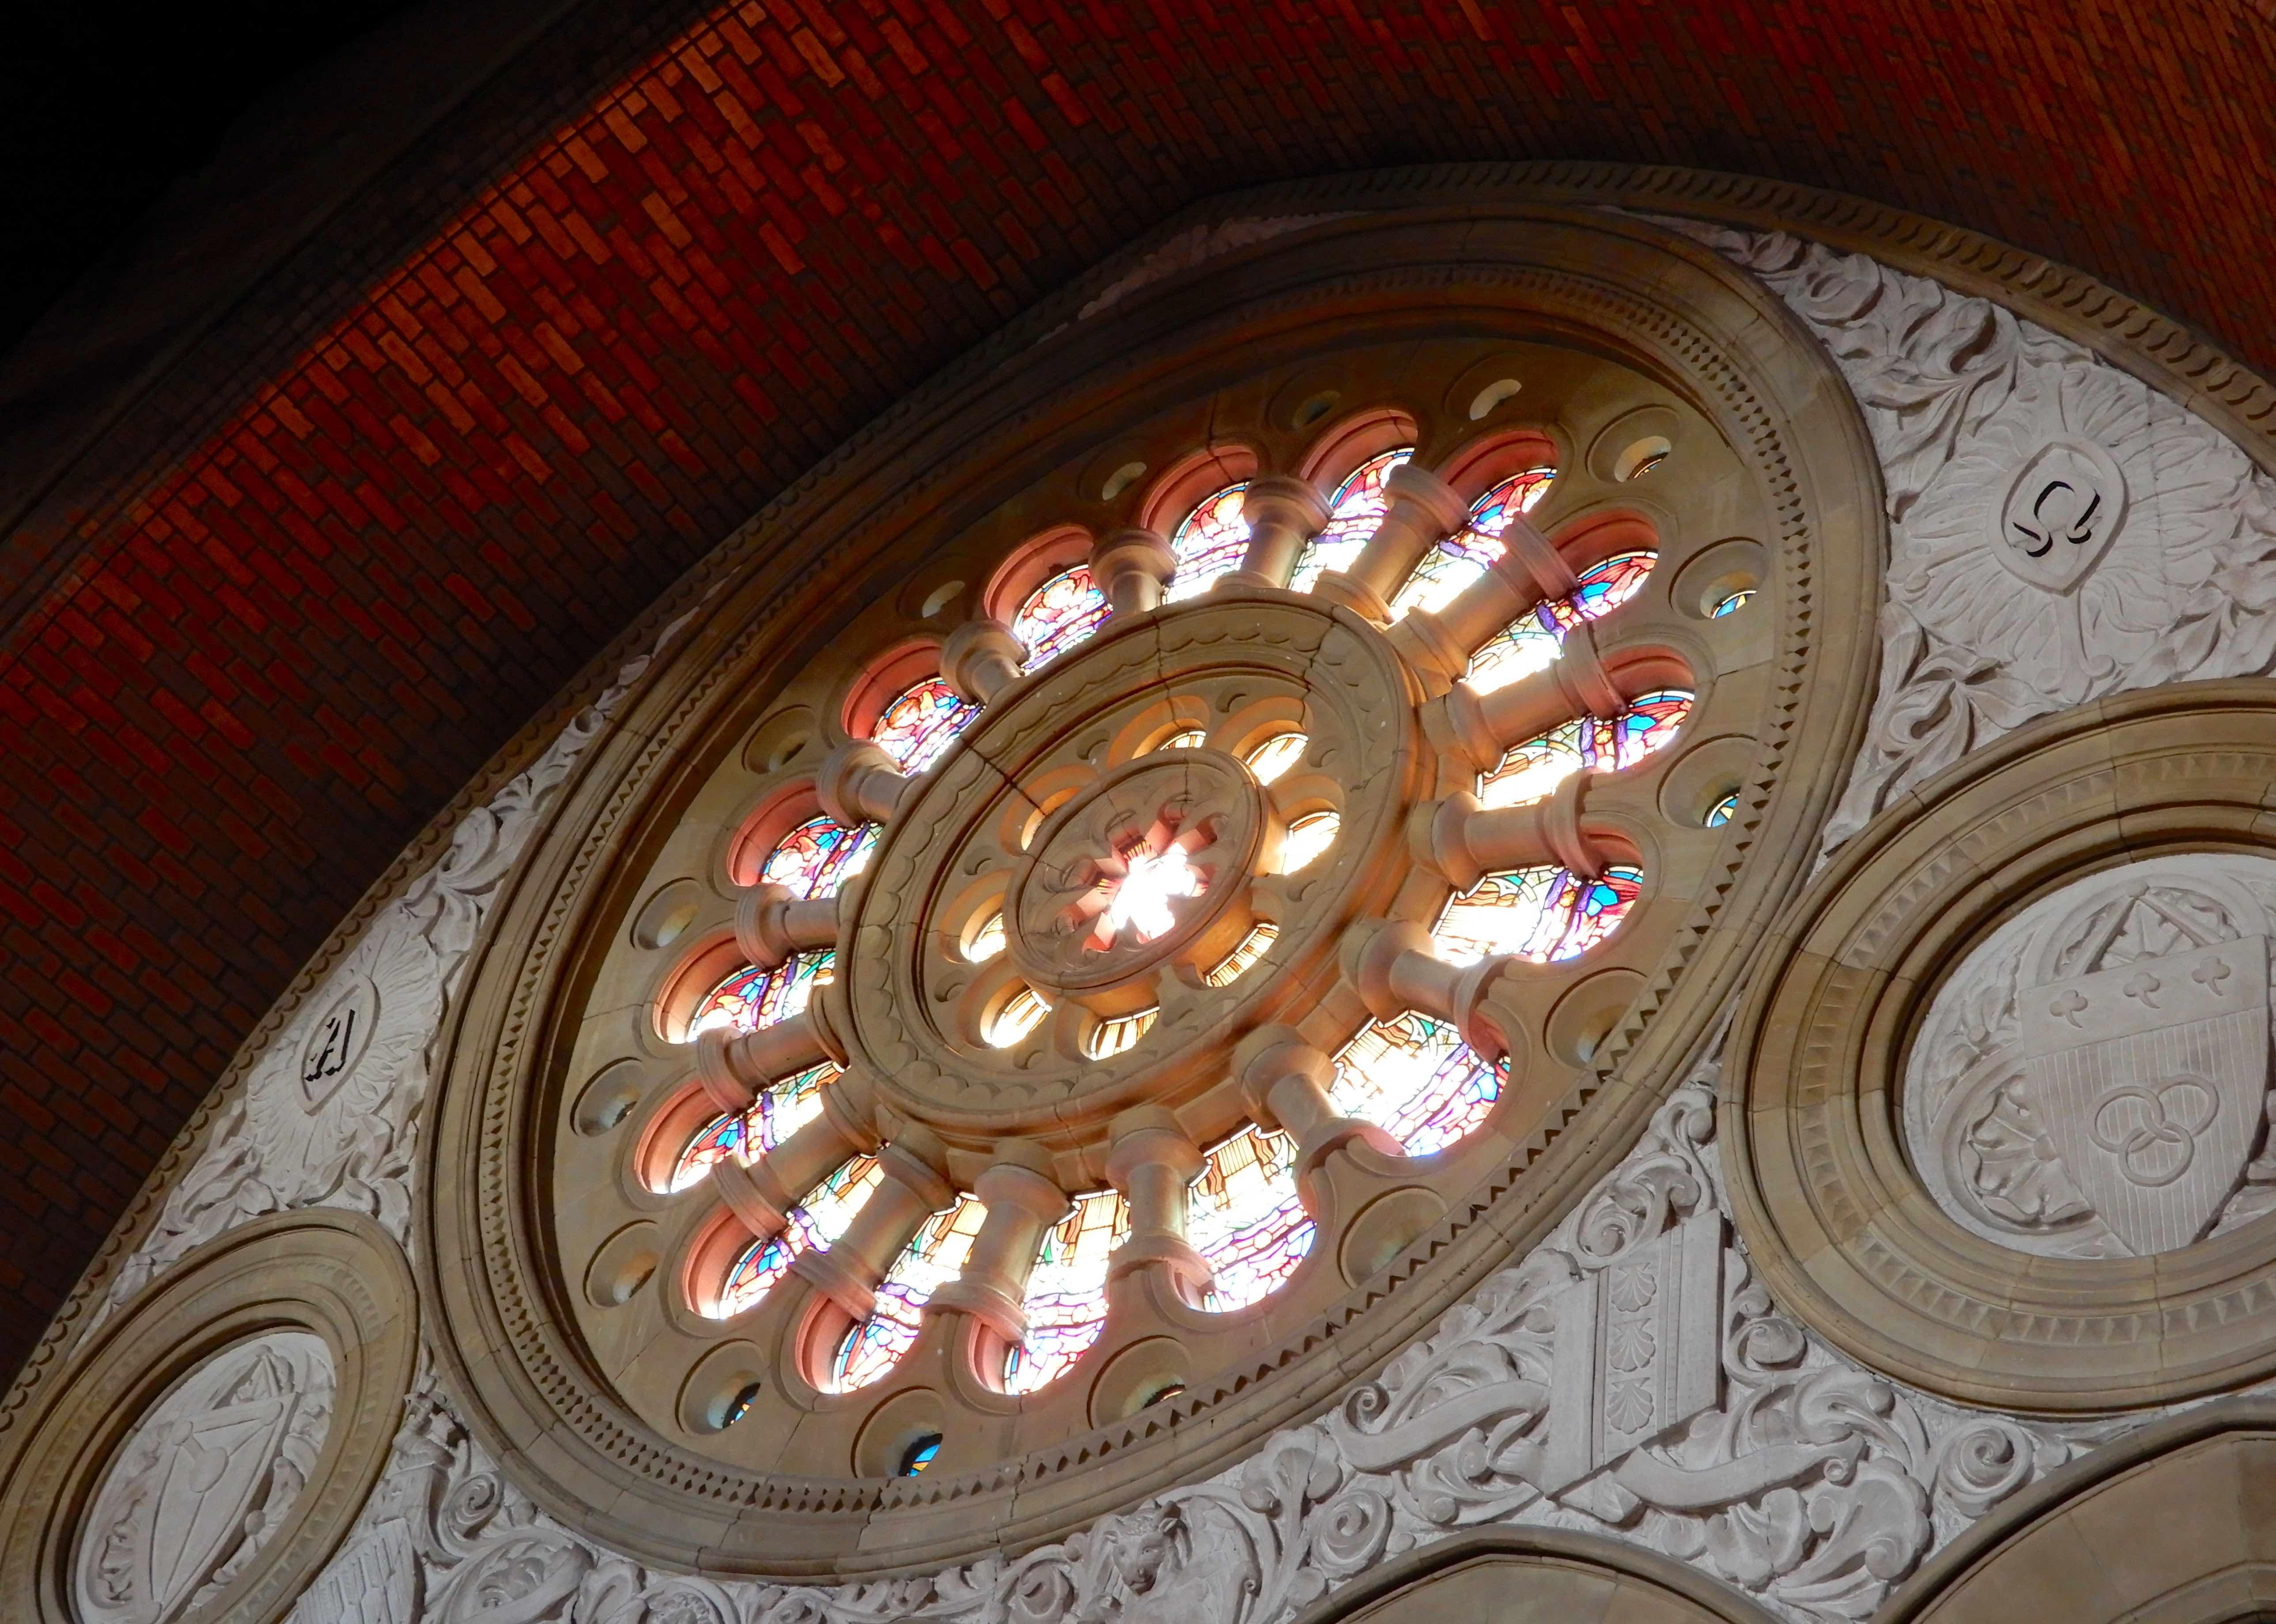 27.rose window from organ loft